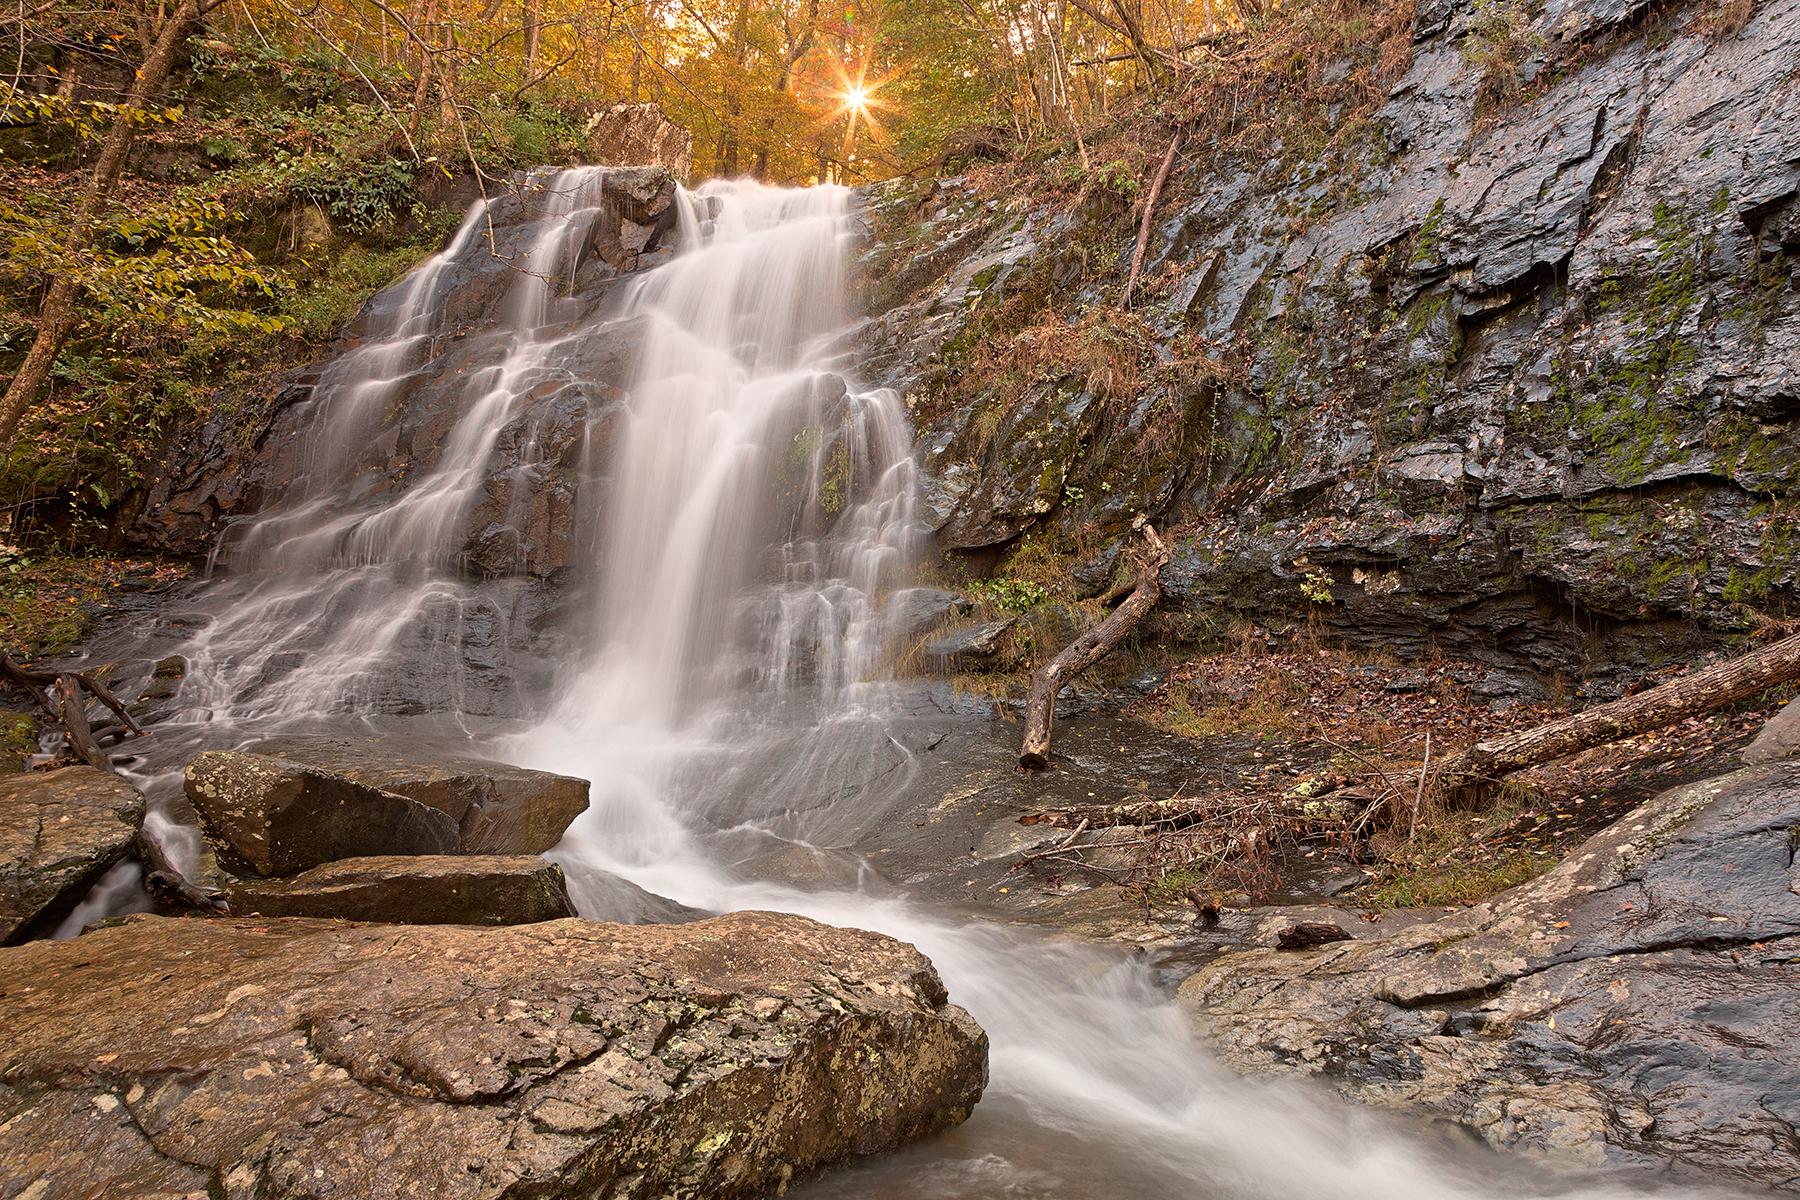 Jones sun waterfall - hdr photo